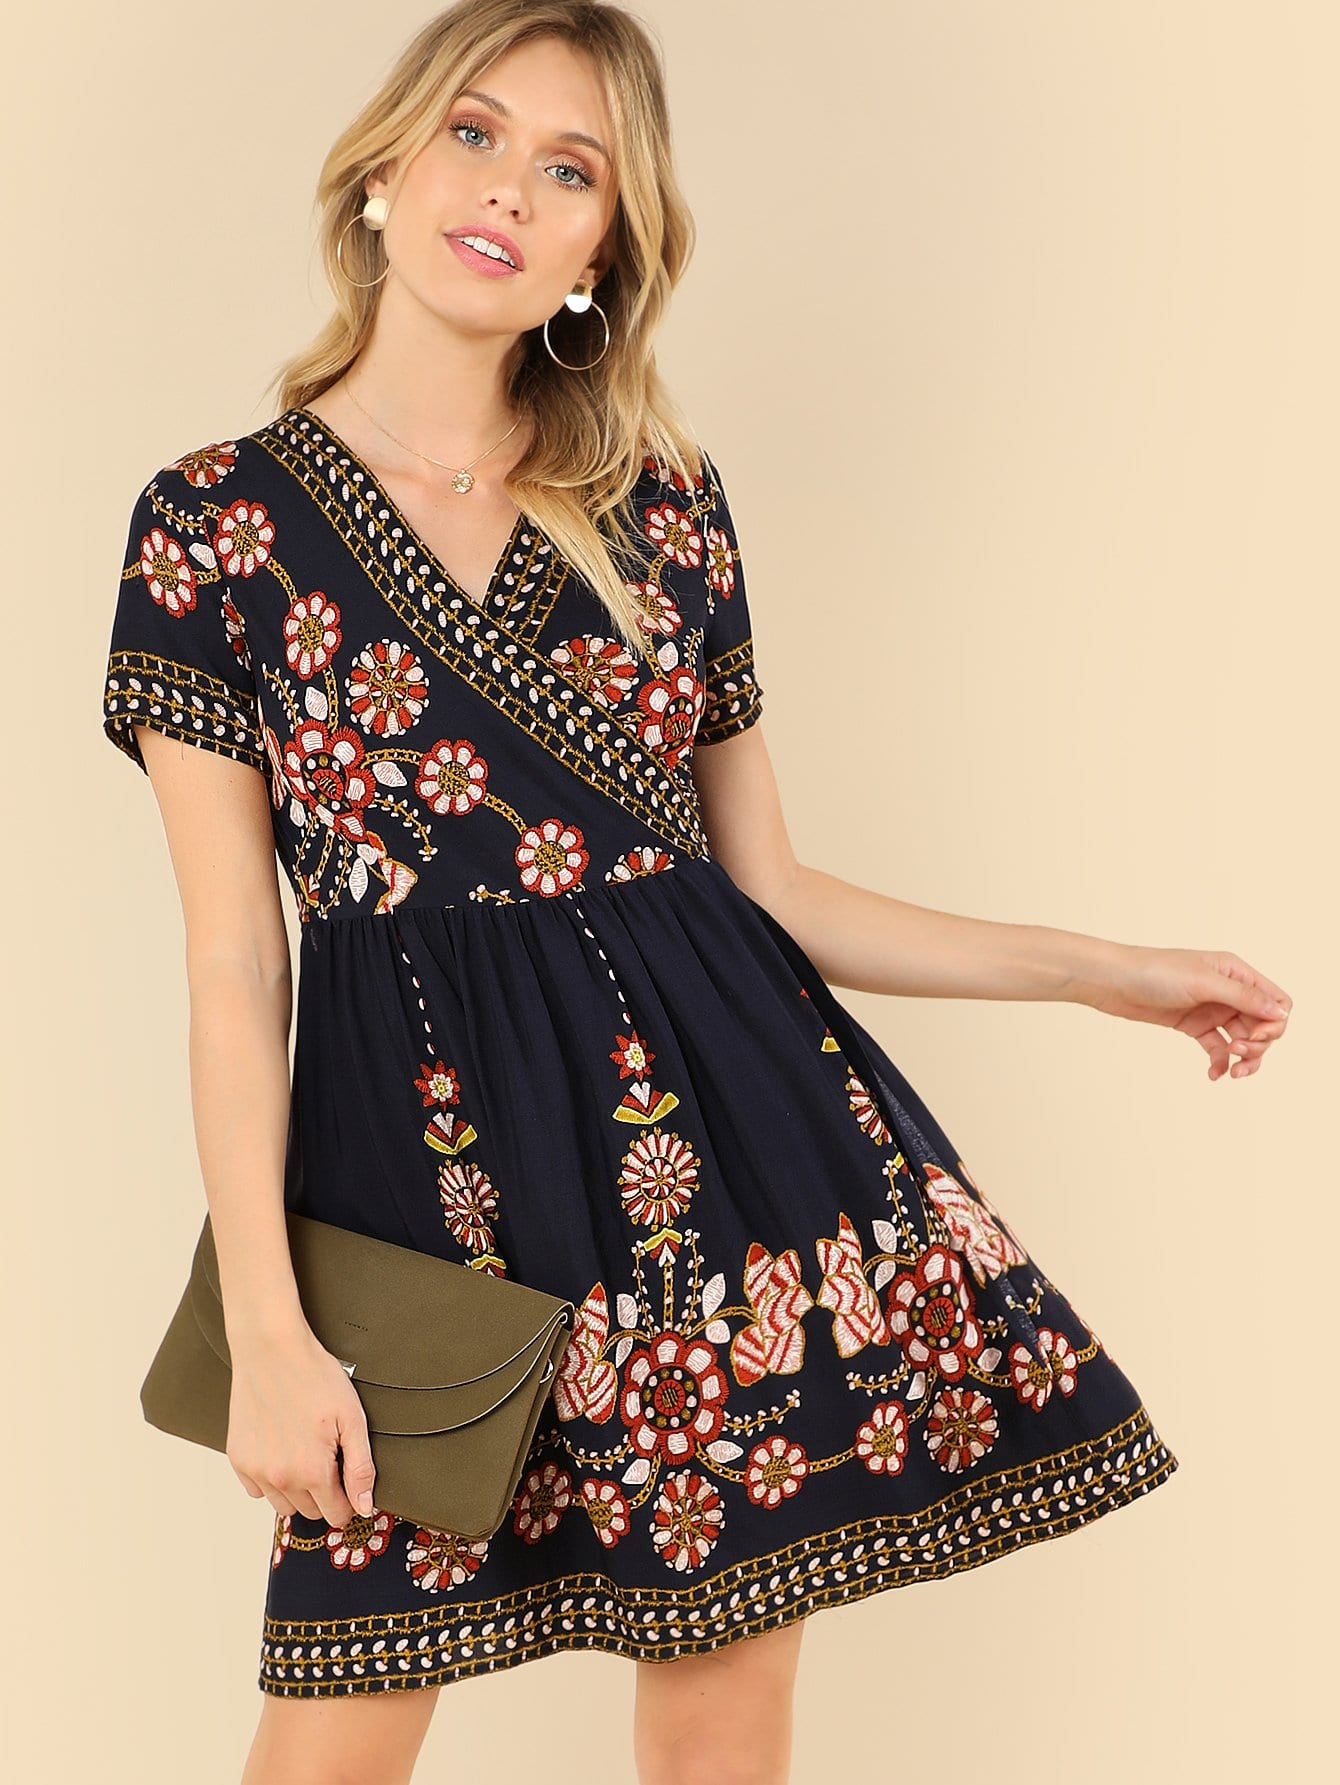 Купить Платье с принтом племени, Noelle Brown, SheIn